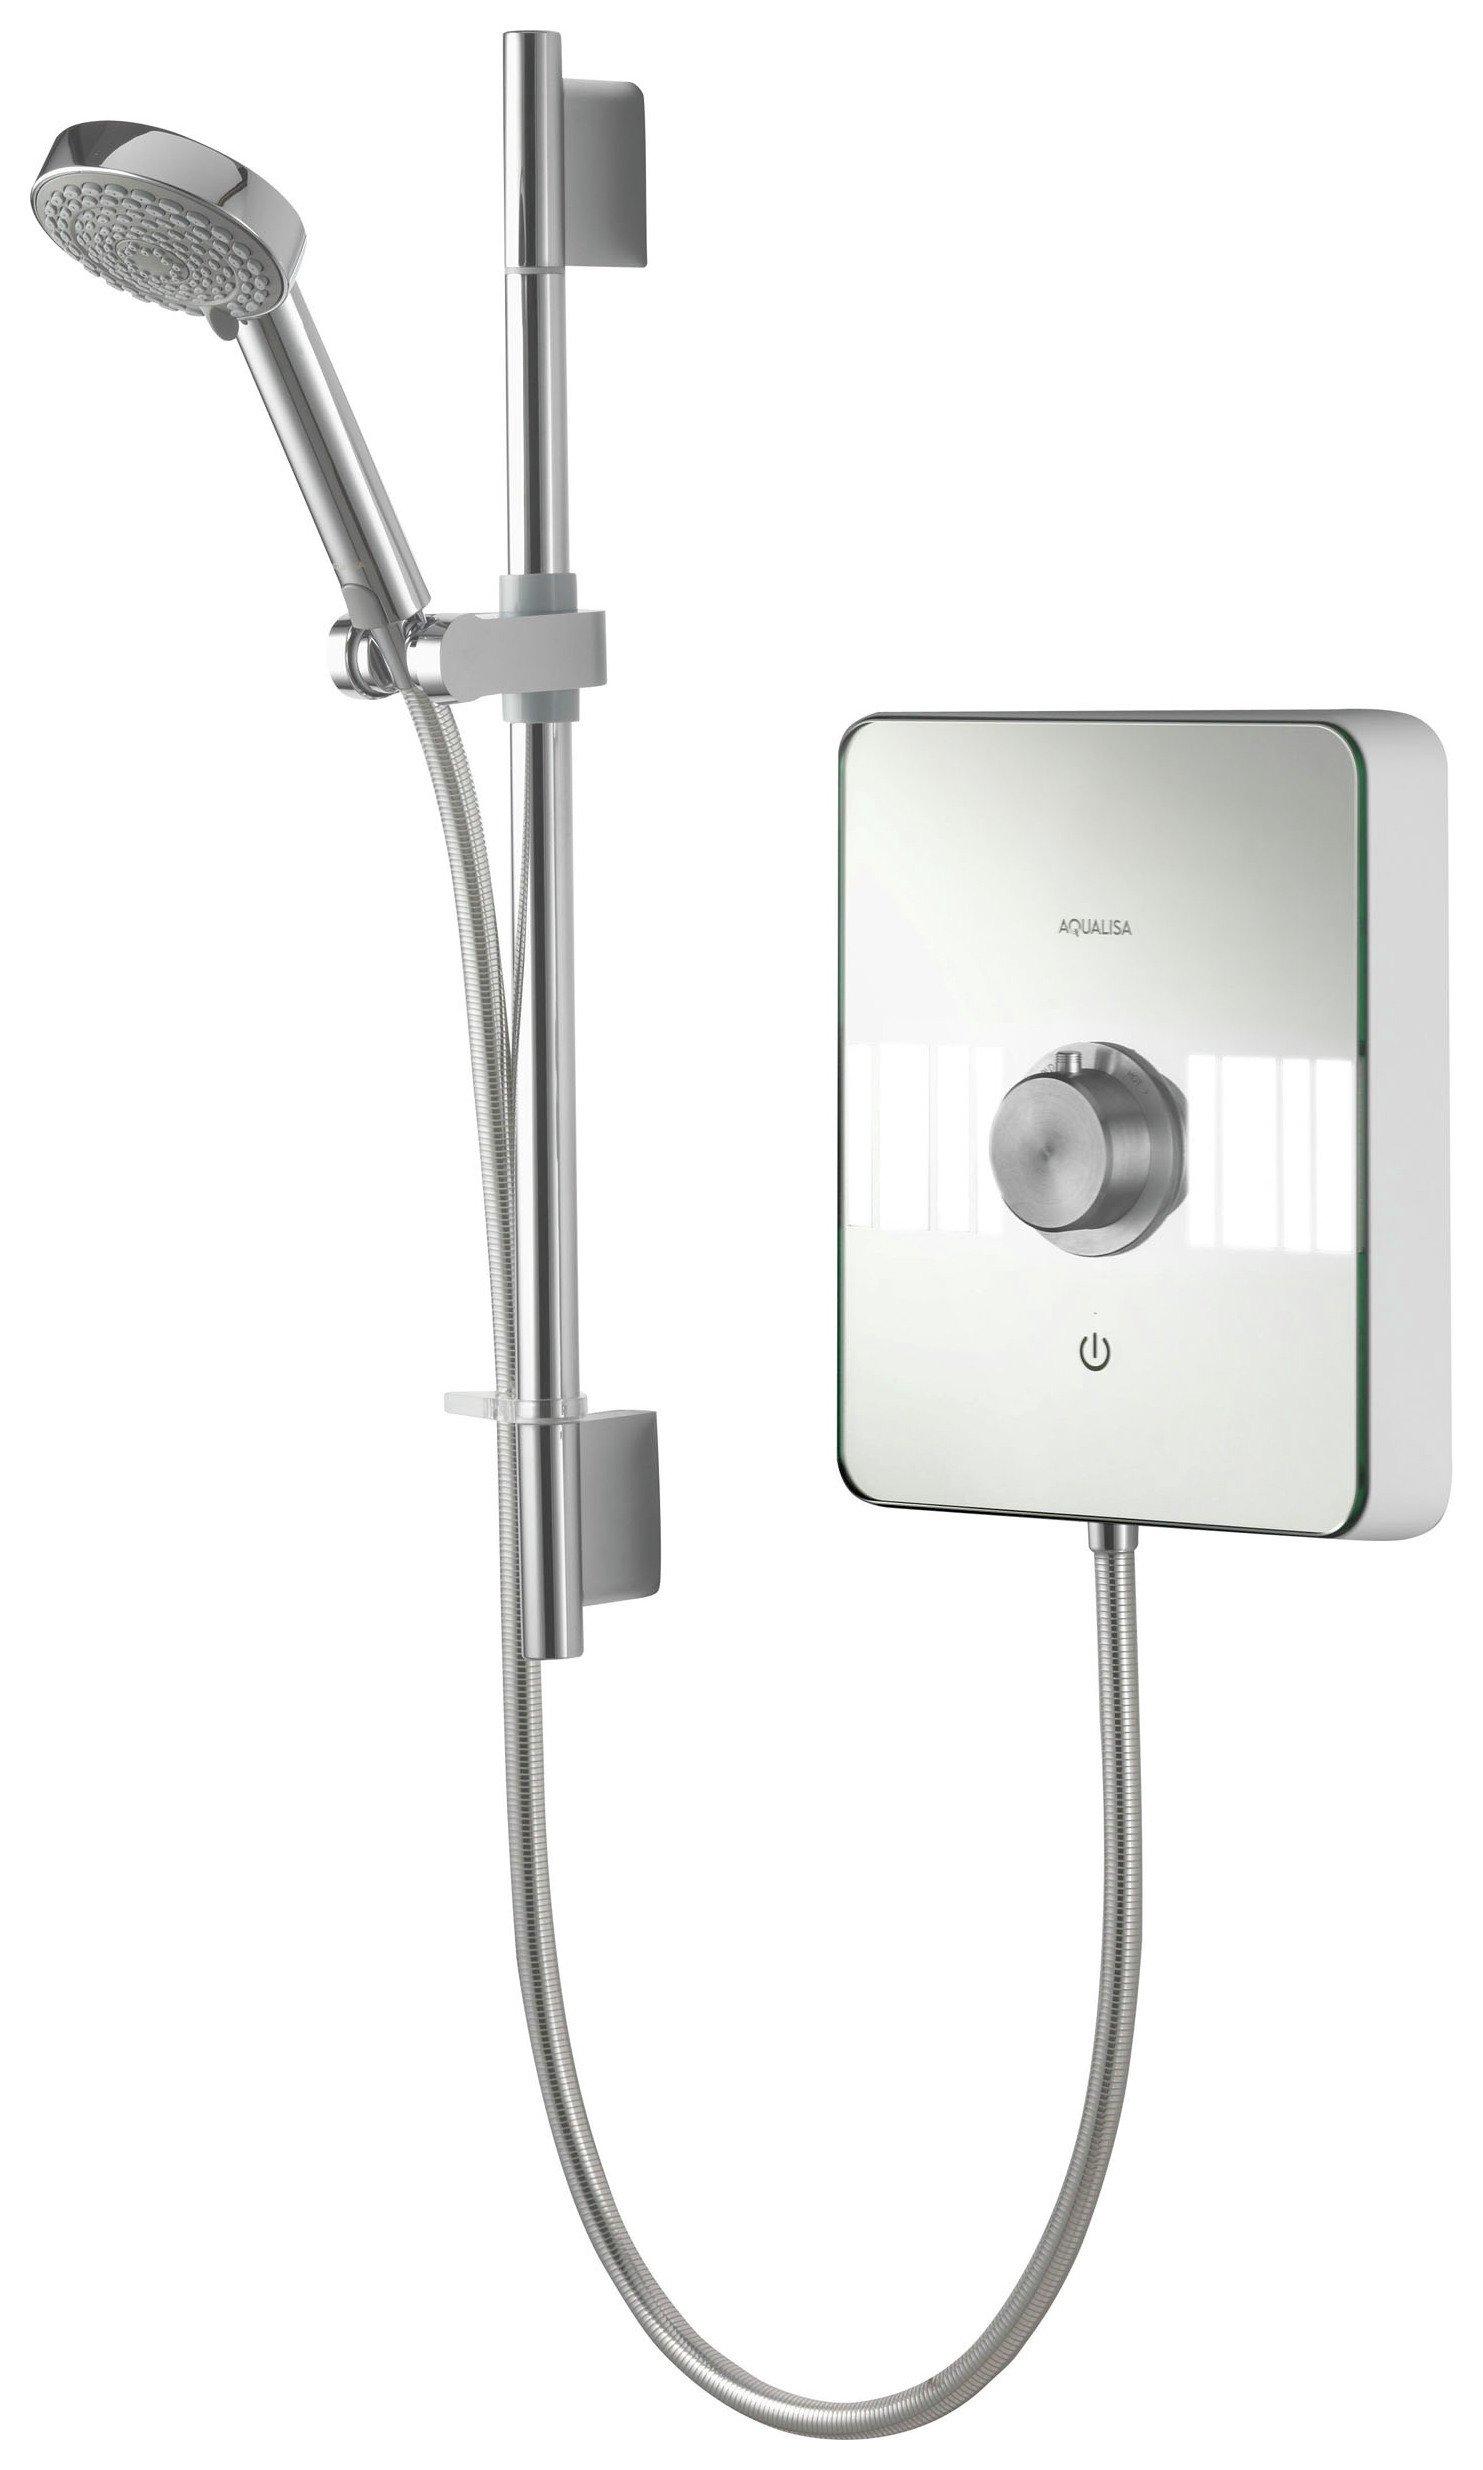 Image of Aqualisa Lumi 8.5kW Electric Shower - Chrome